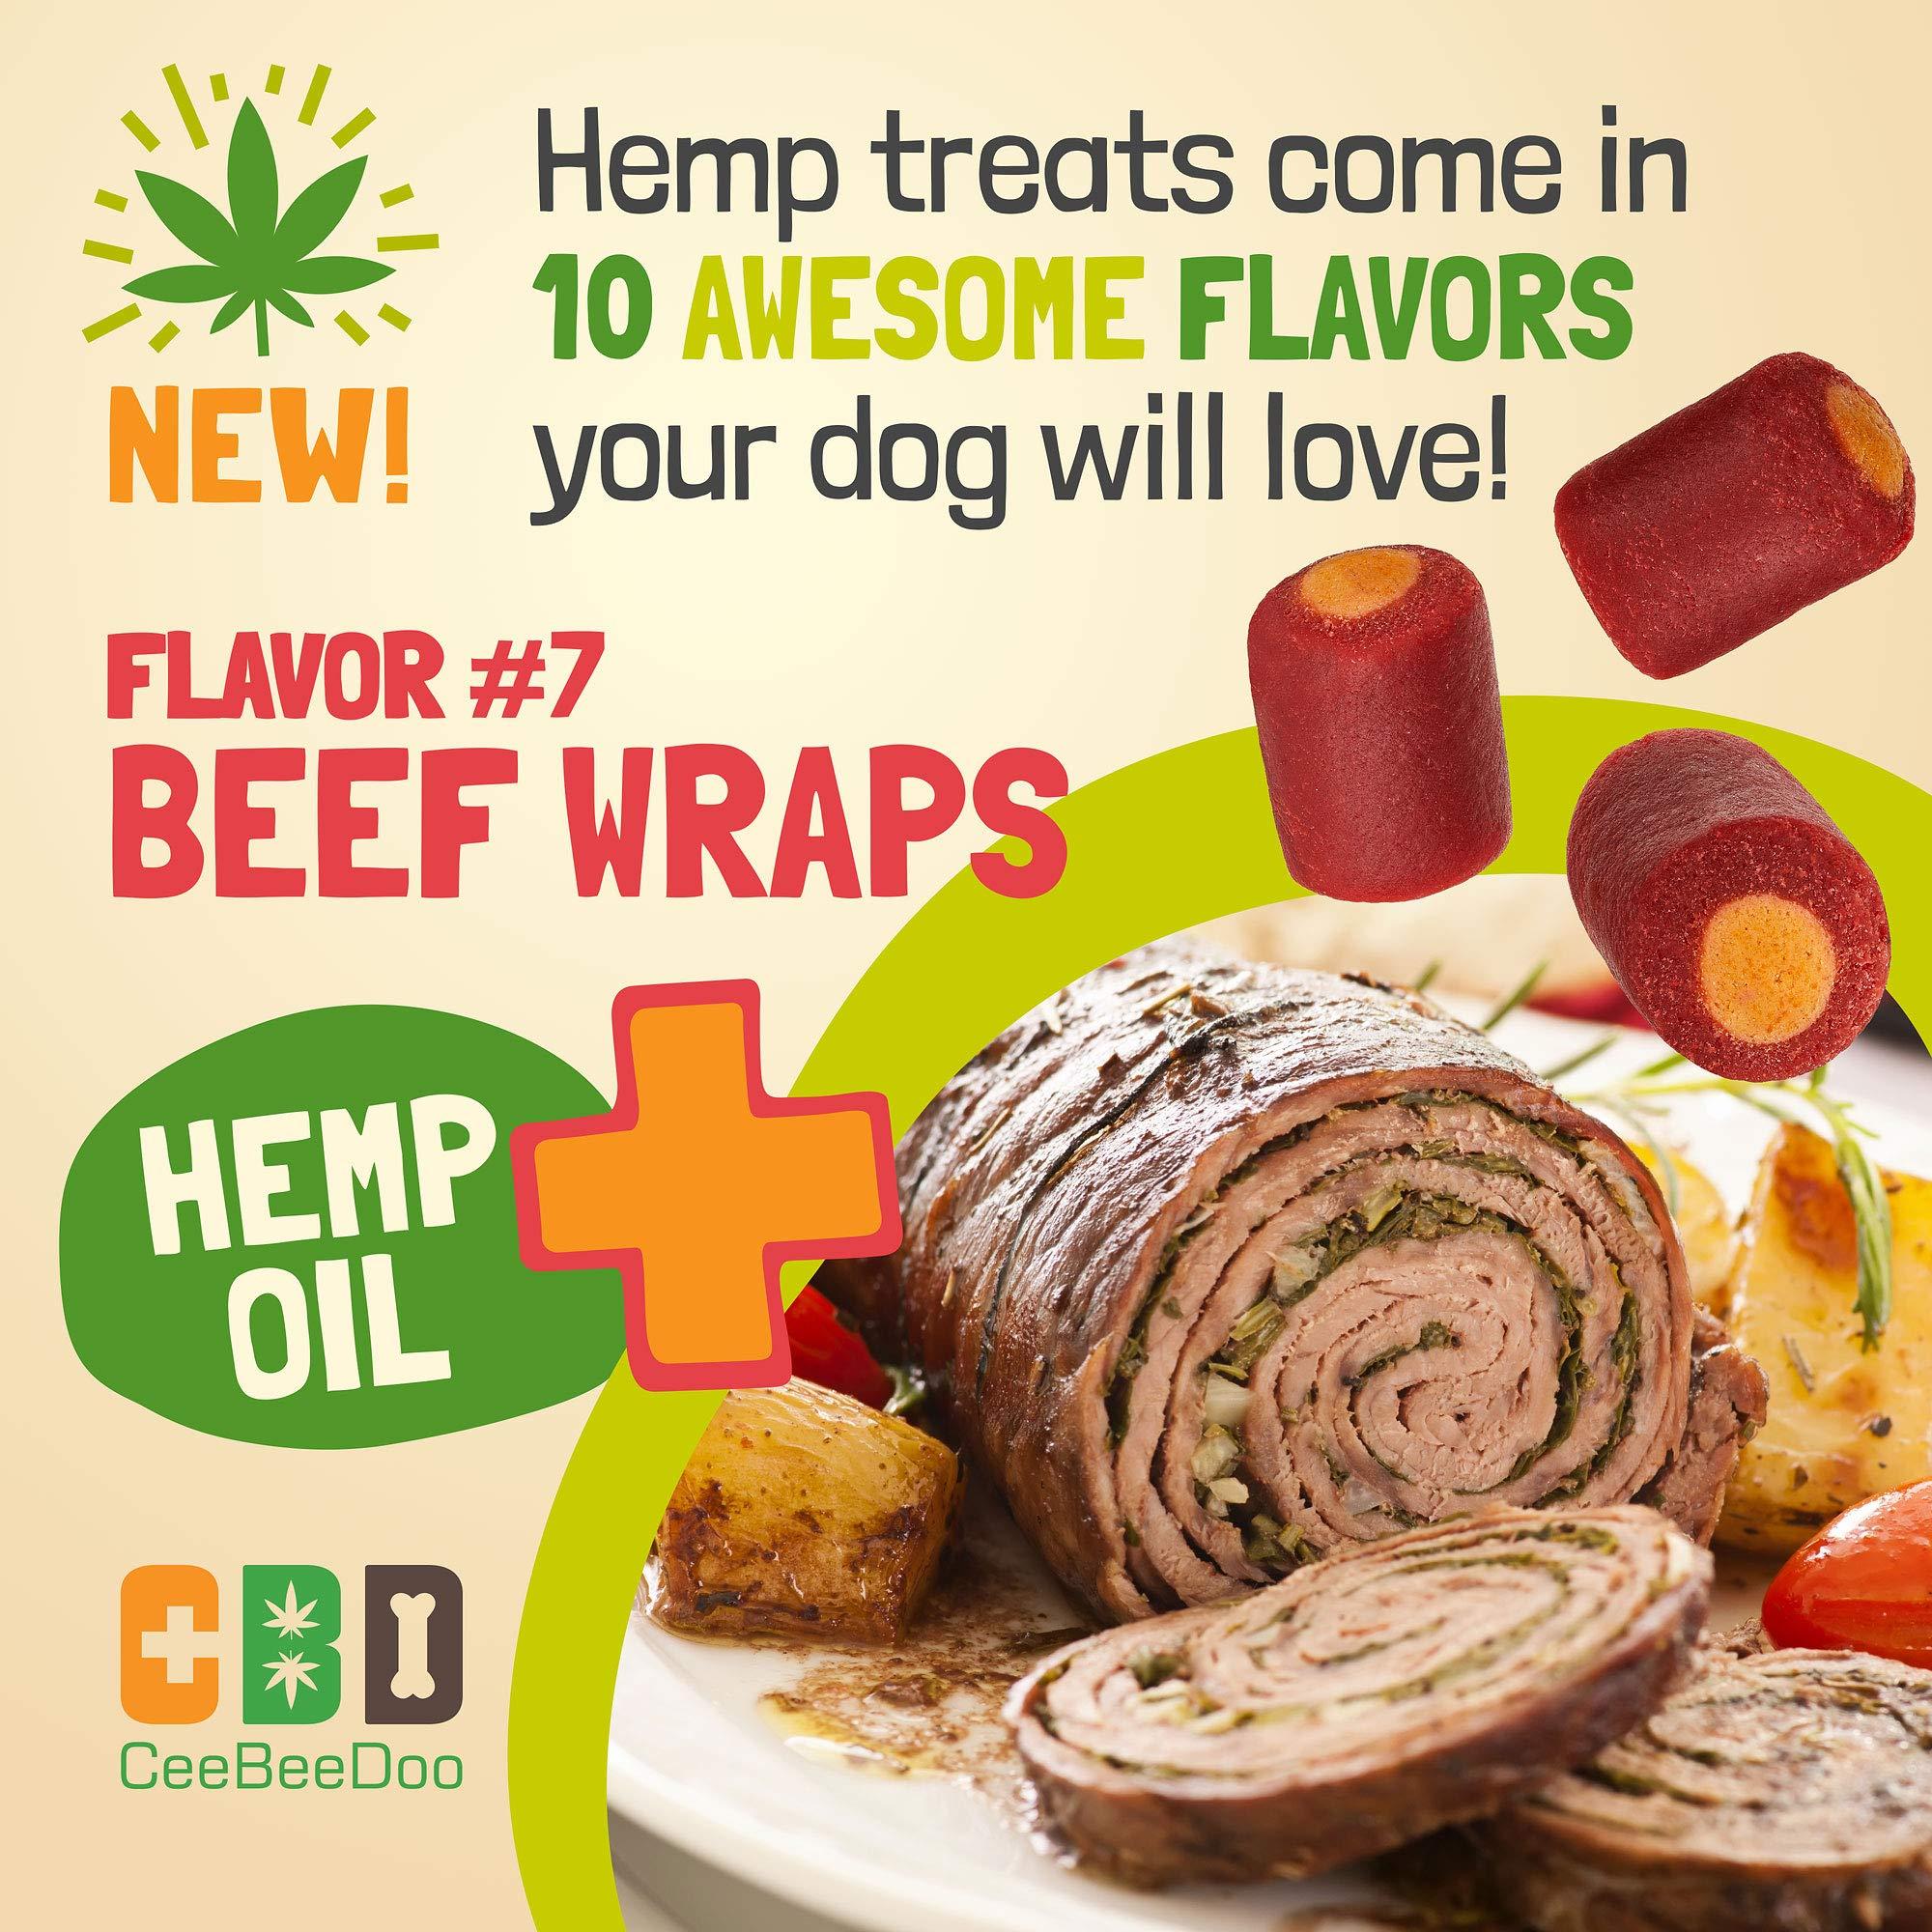 Ceebeedoo Dog Treats With Hemp Oil For Pain Relief